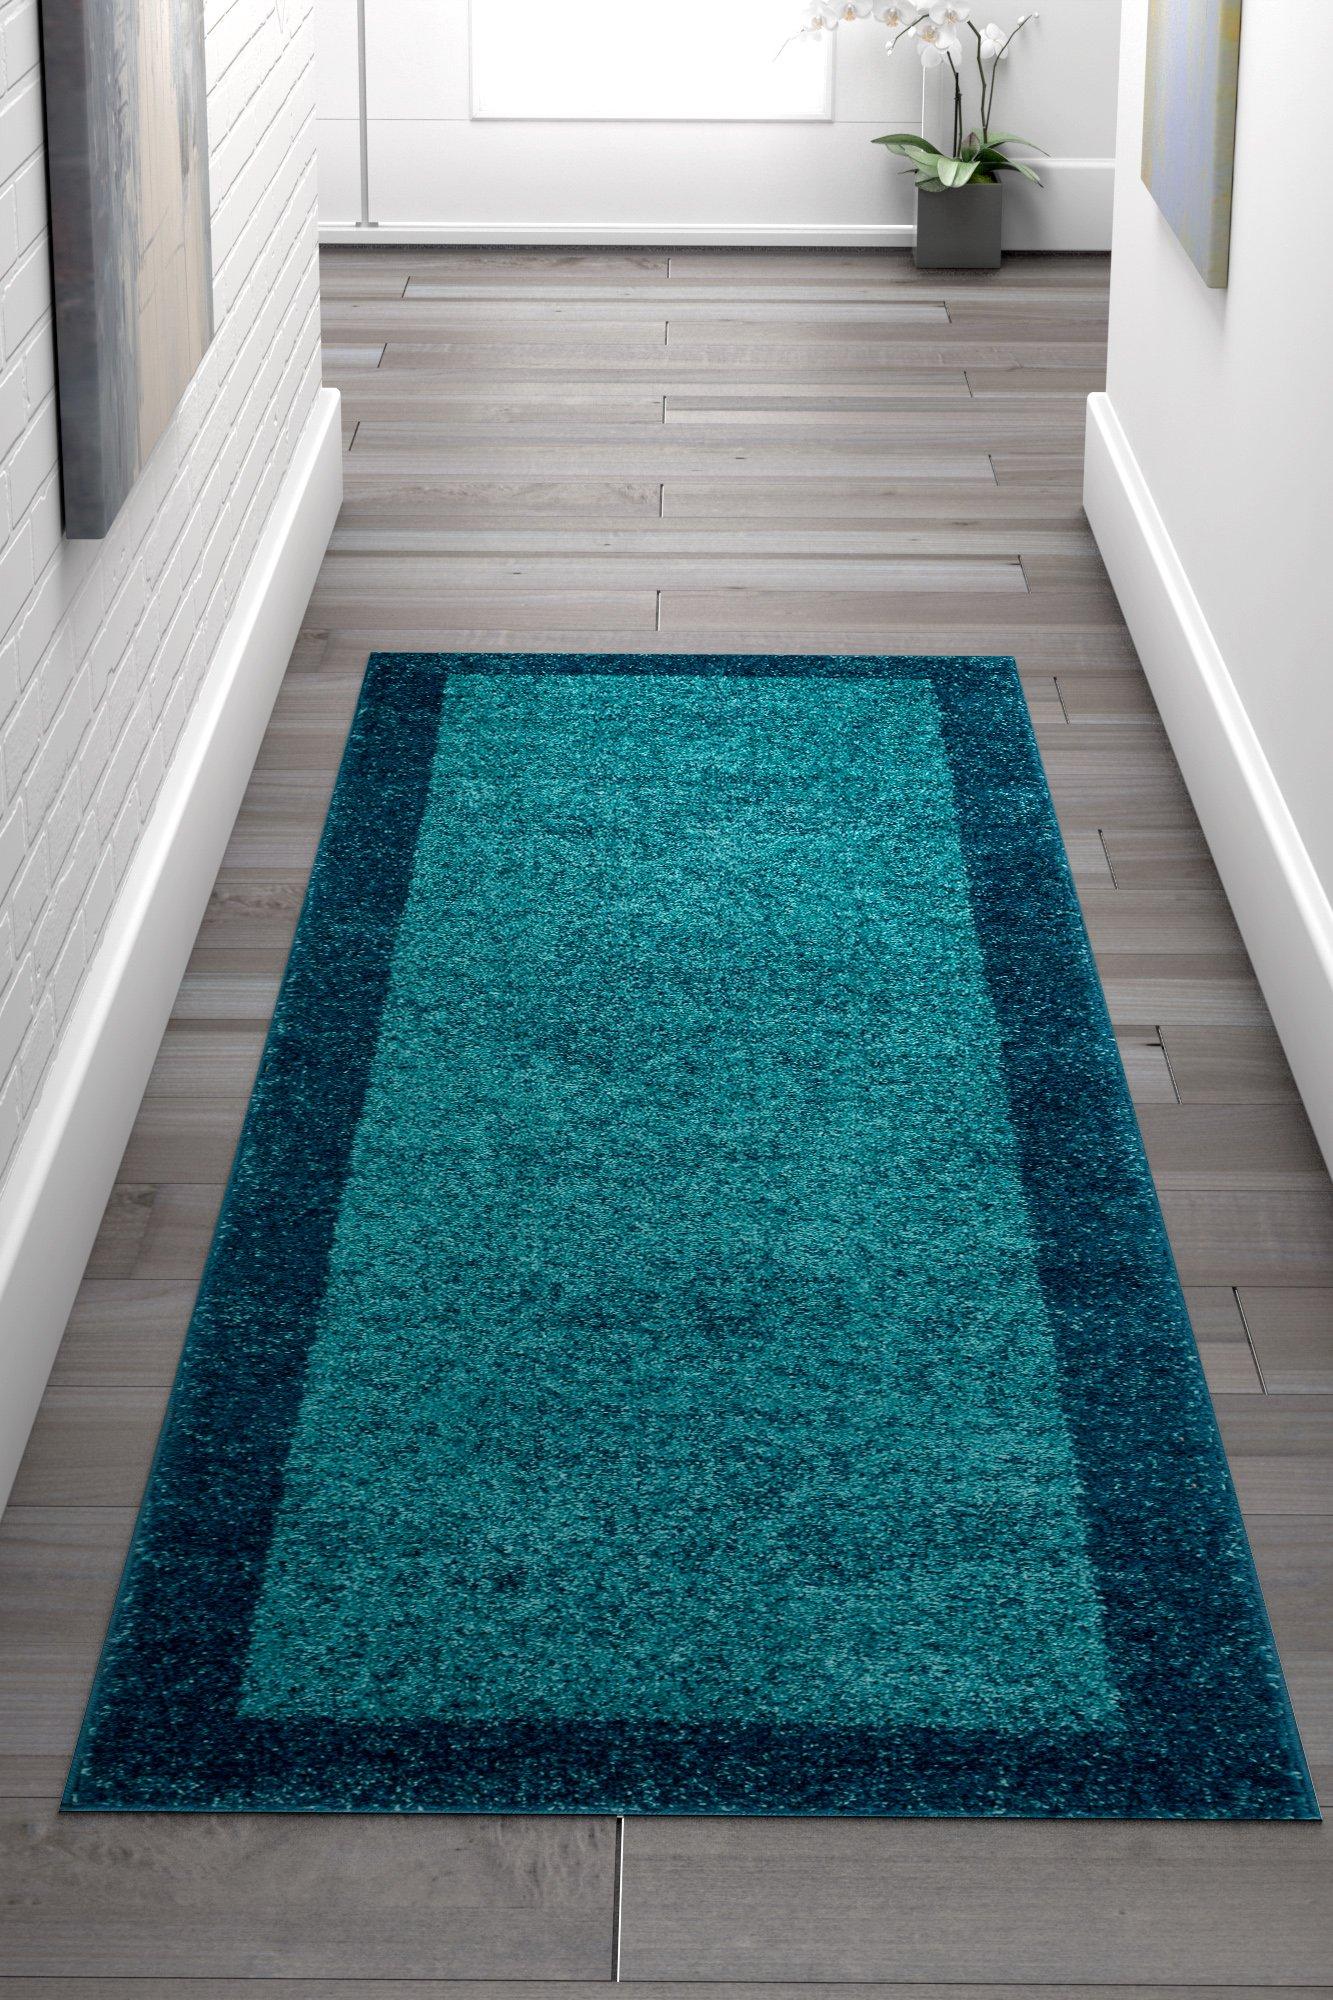 HomeWay Bordered Blue 2'3 x 7'3 Runner Mid-century shaded pattern soft Rug modern Velvety bright soft Area Rug